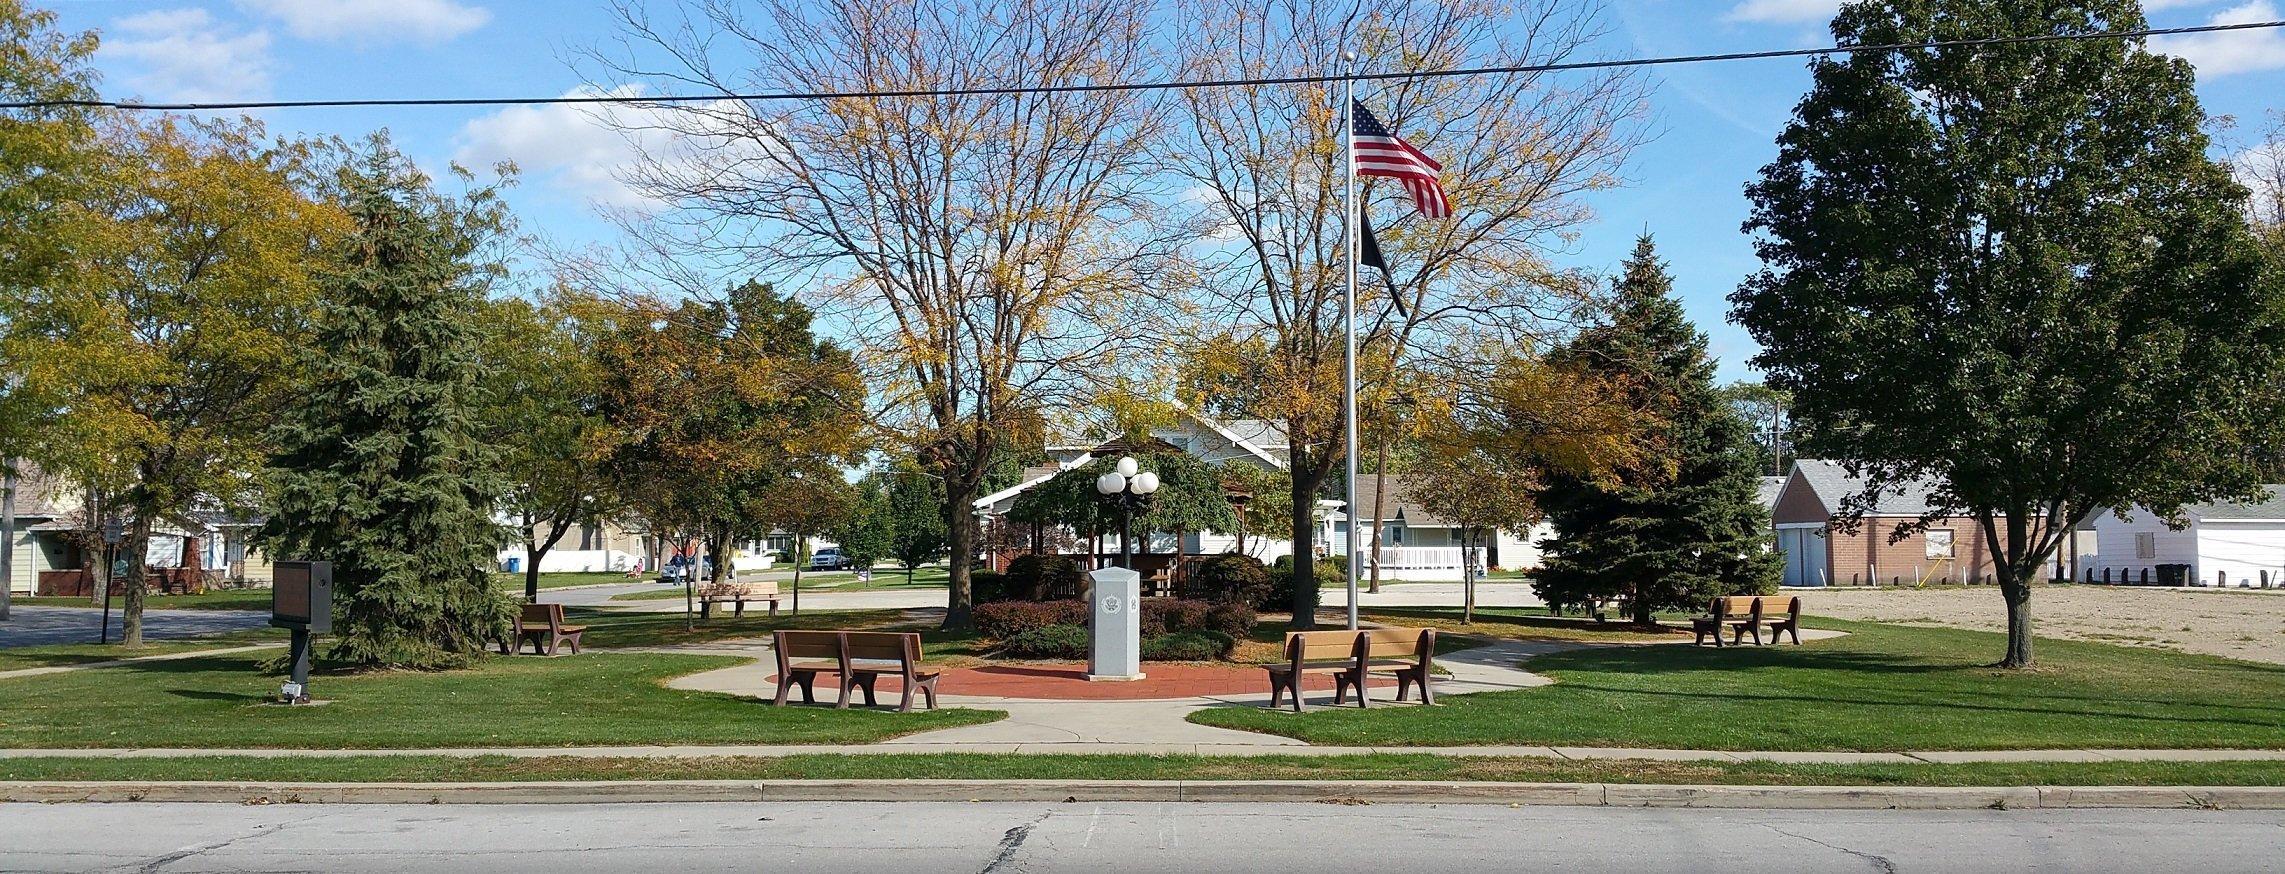 General Information About Village of Walbridge Ohio